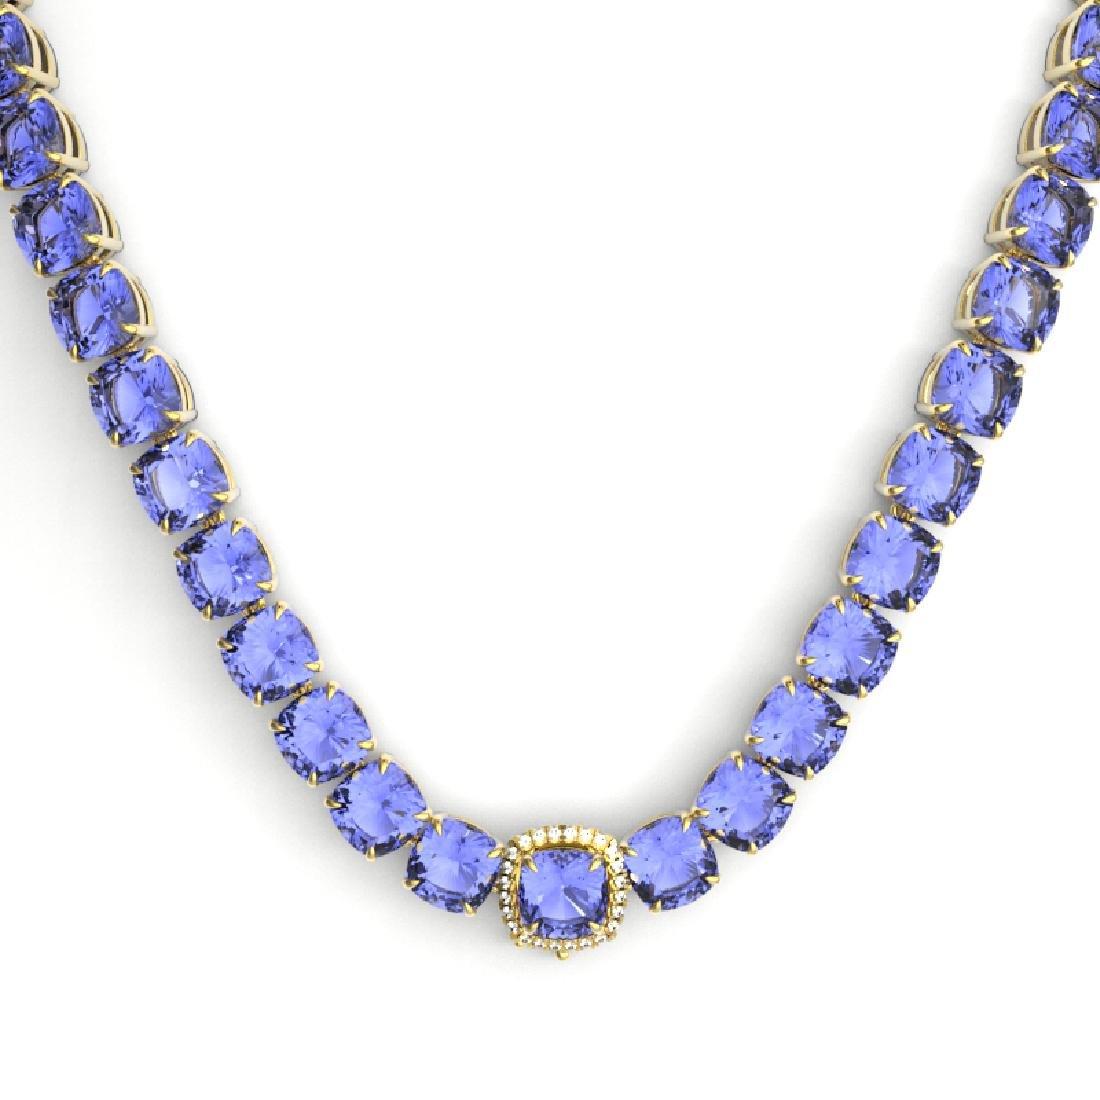 100 CTW Tanzanite & VS/SI Diamond Necklace 14K Yellow - 2